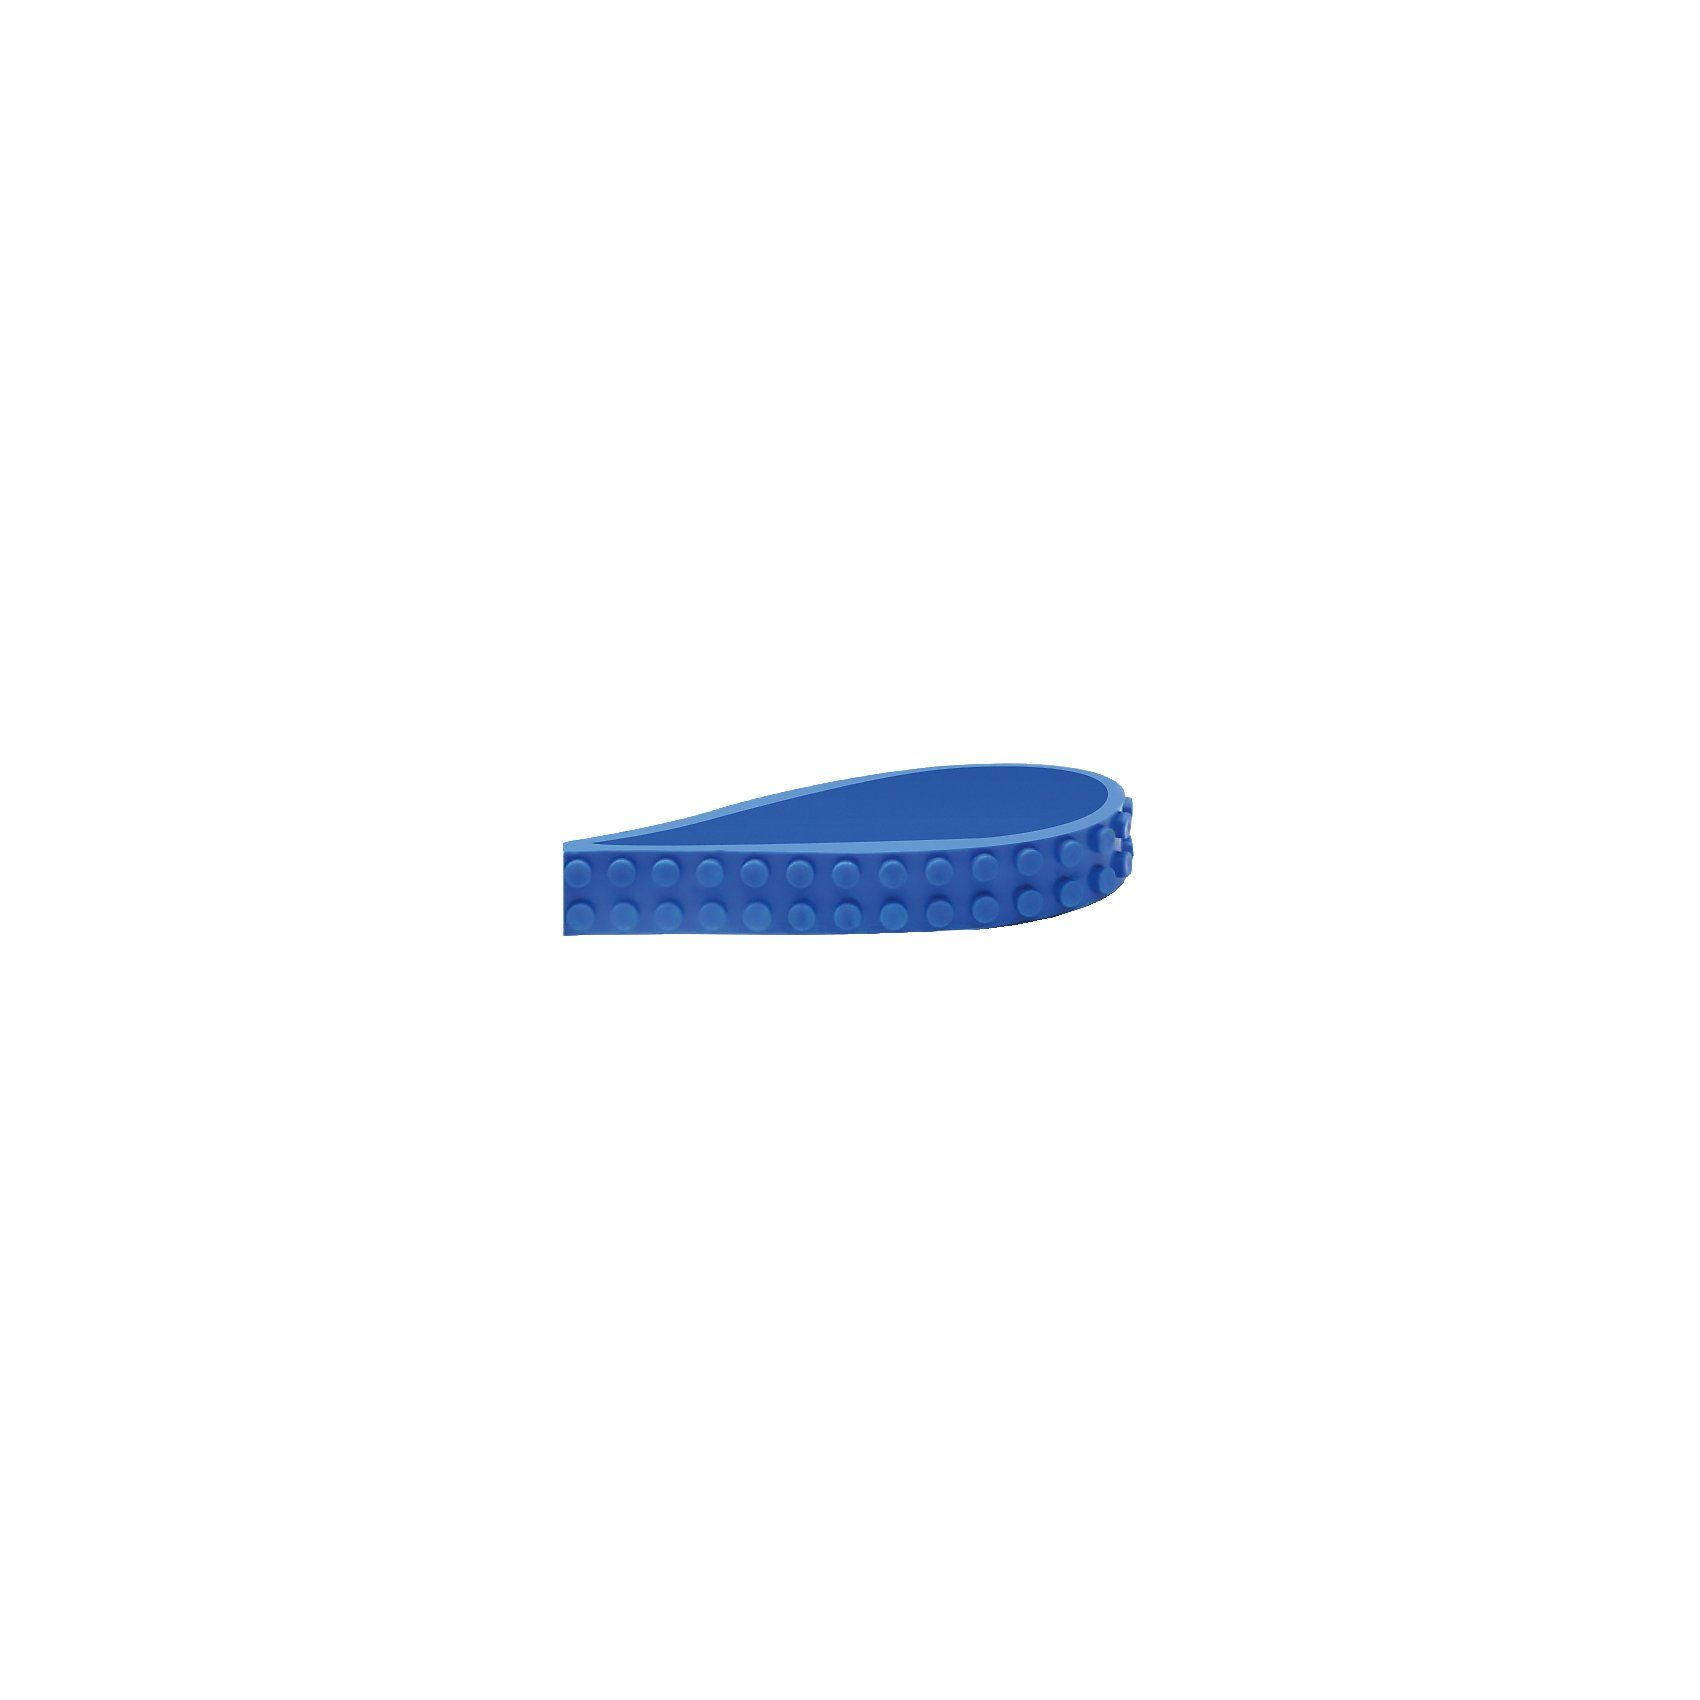 BOTI Mayka Tape - Medium 2m 2 Studs - Blau